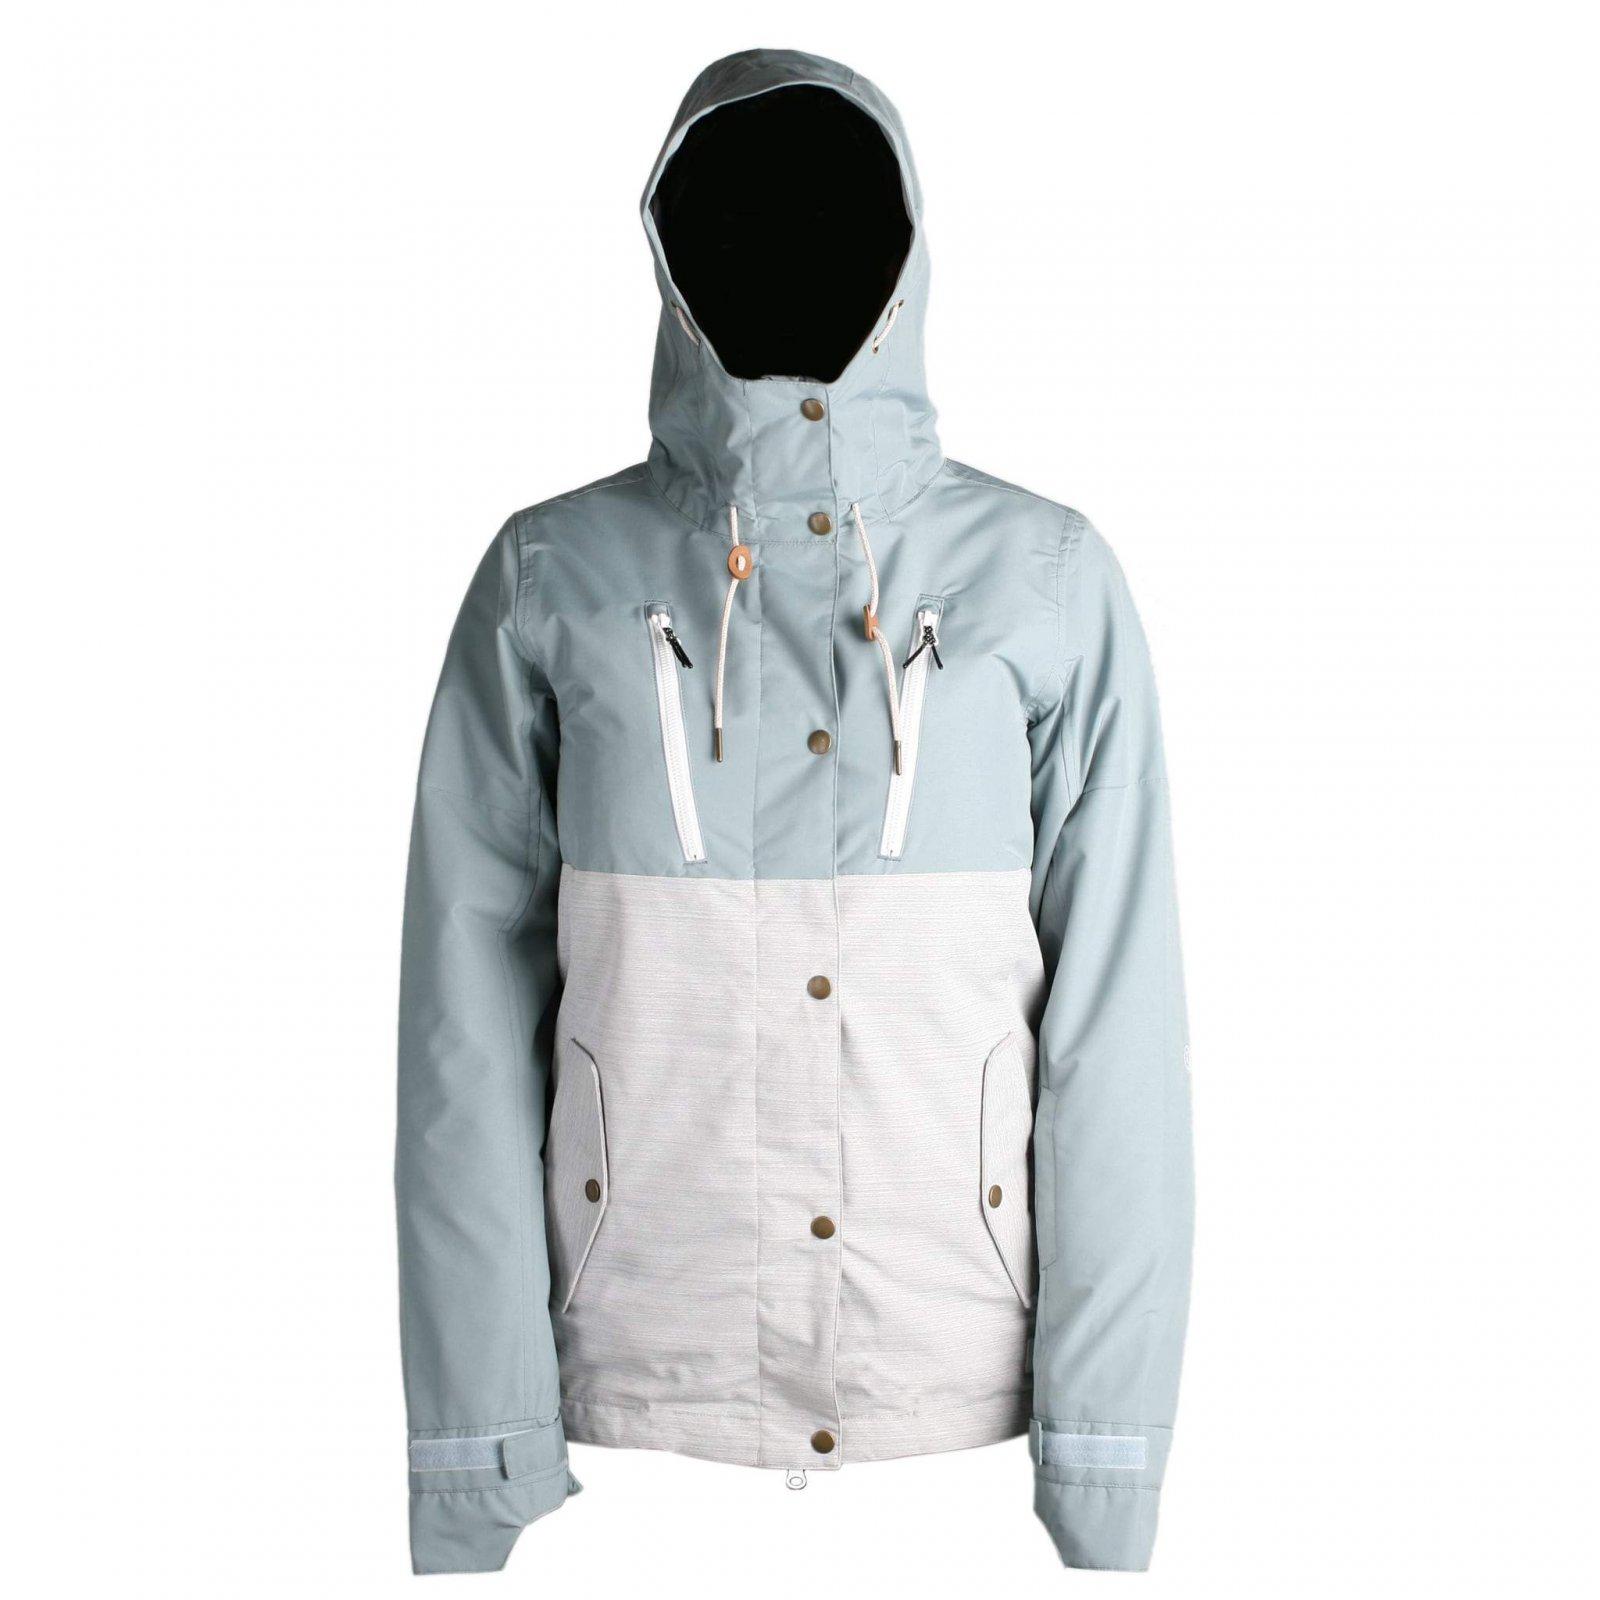 Ride Wallingford Women's Insulated Jacket